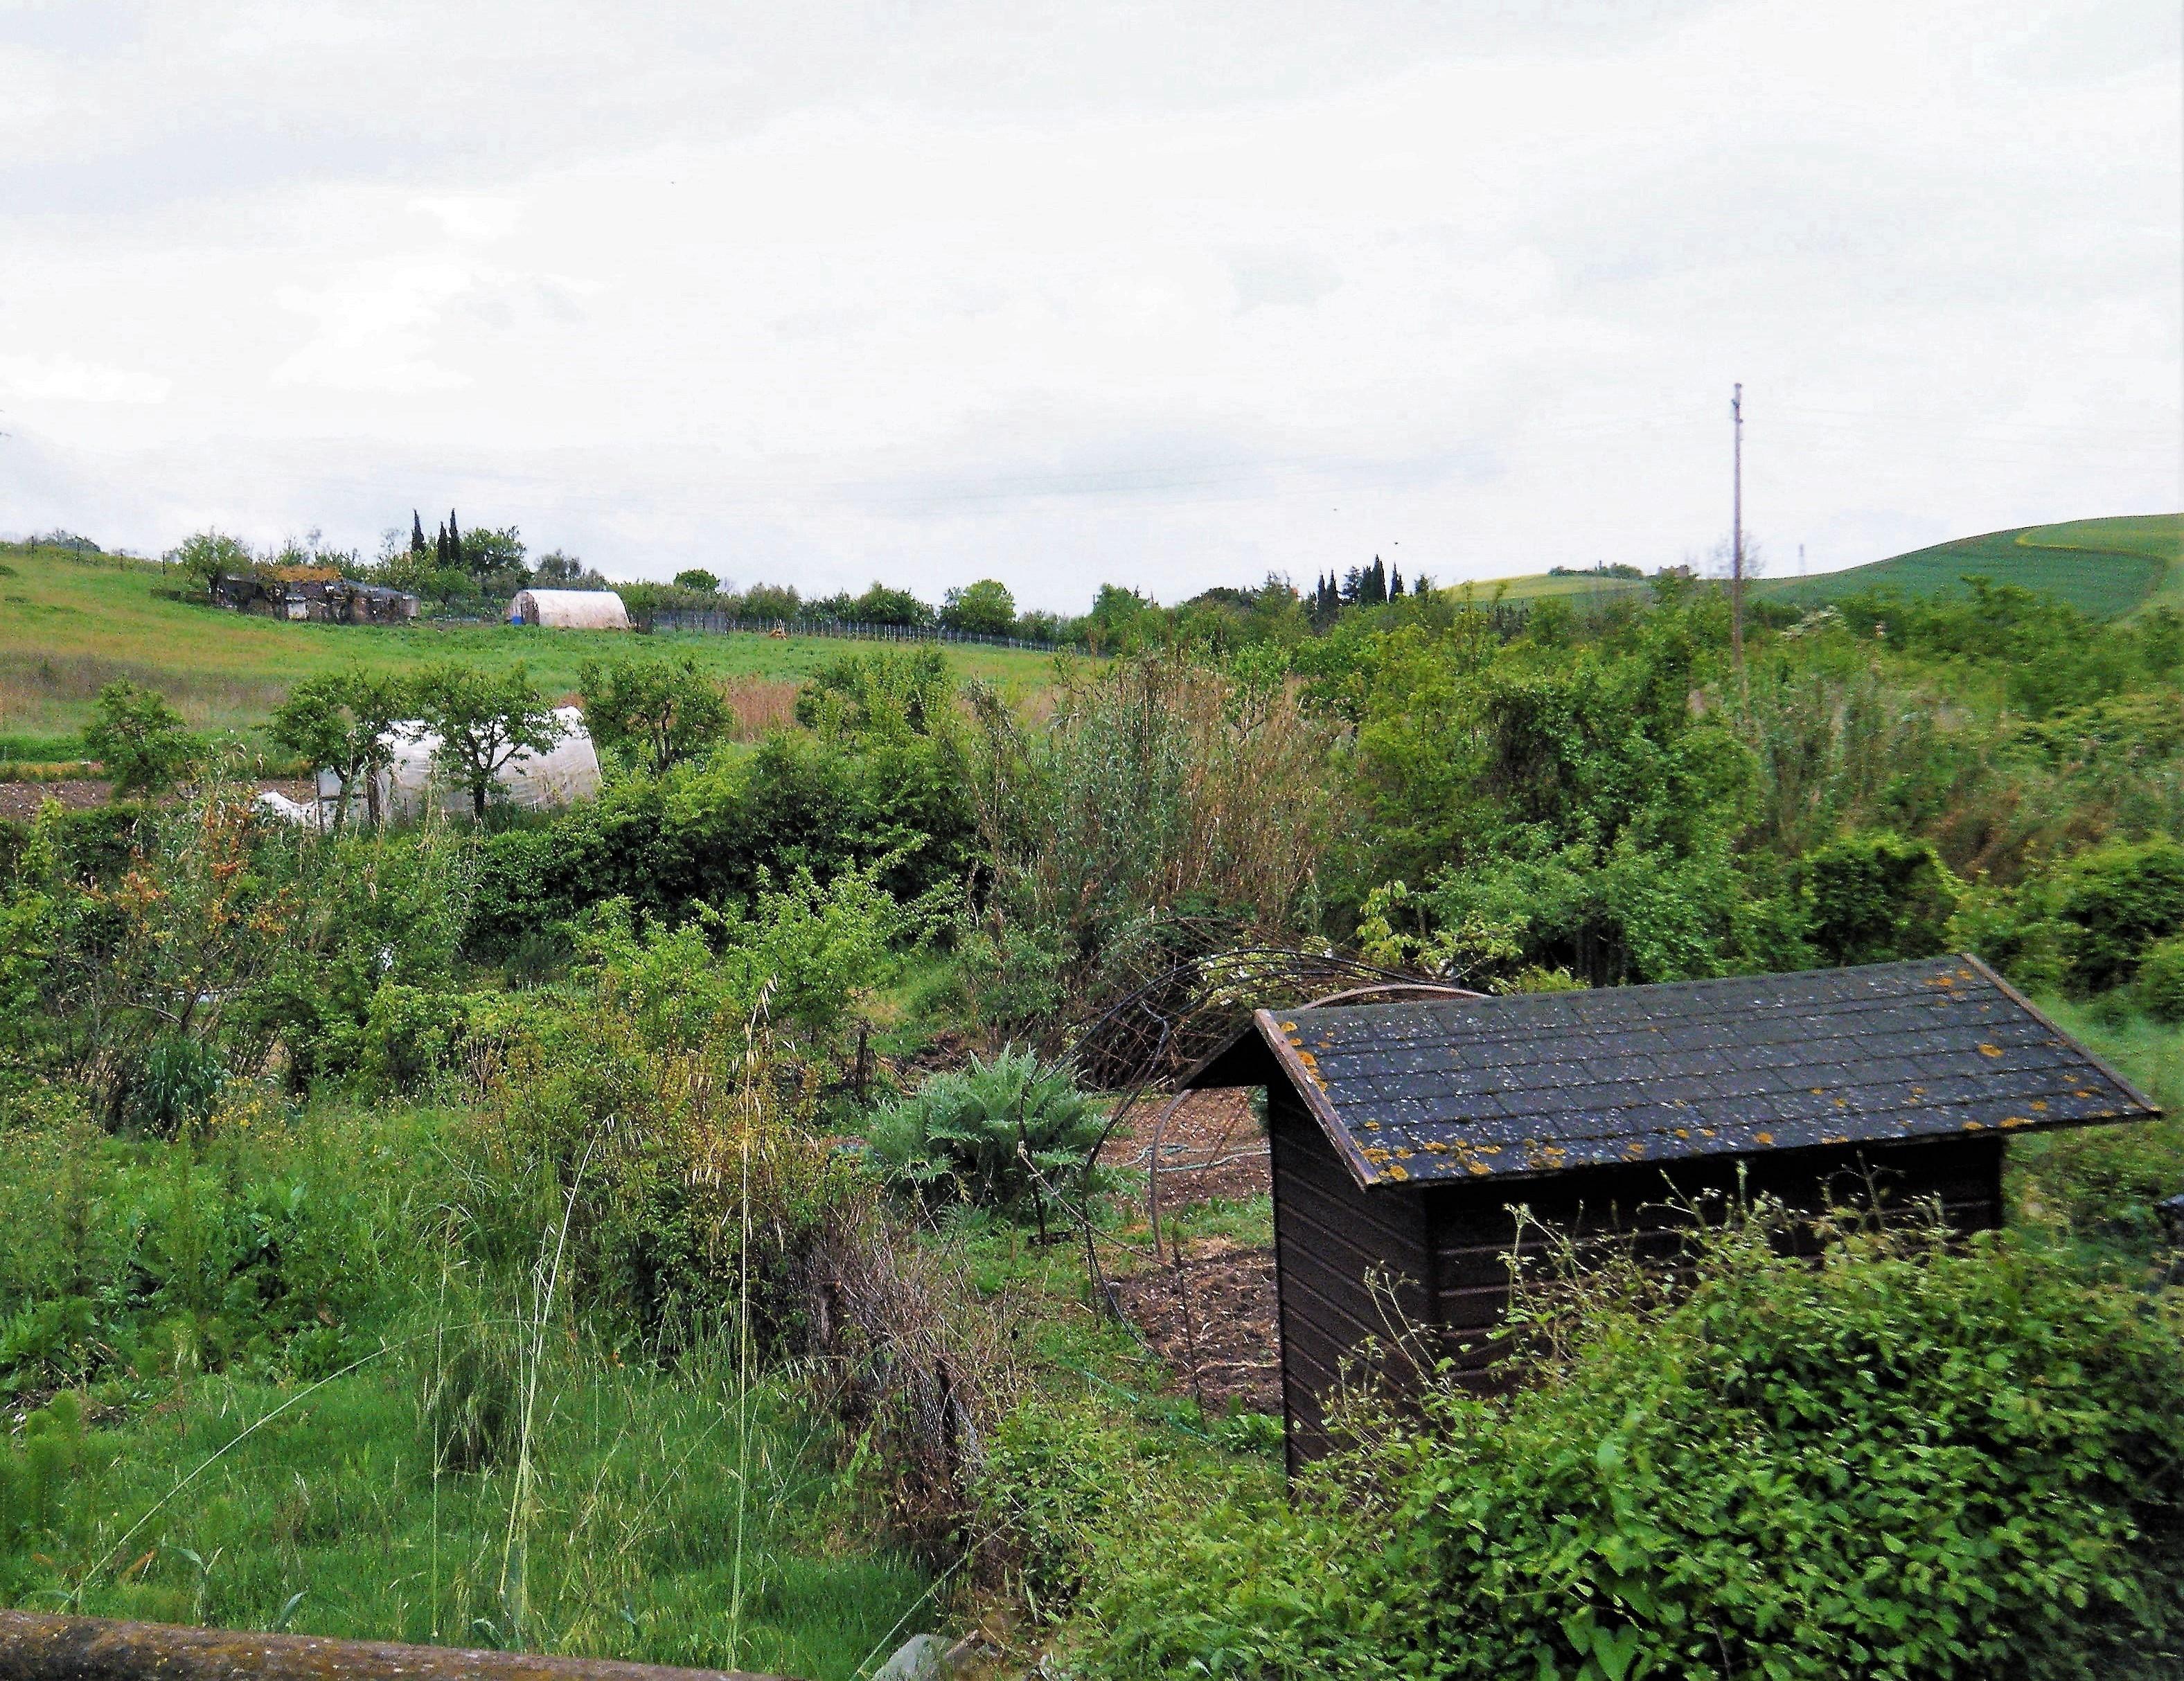 File:Huts and vegetable gardens, San Casciano dei Bagni, Tuscany ...